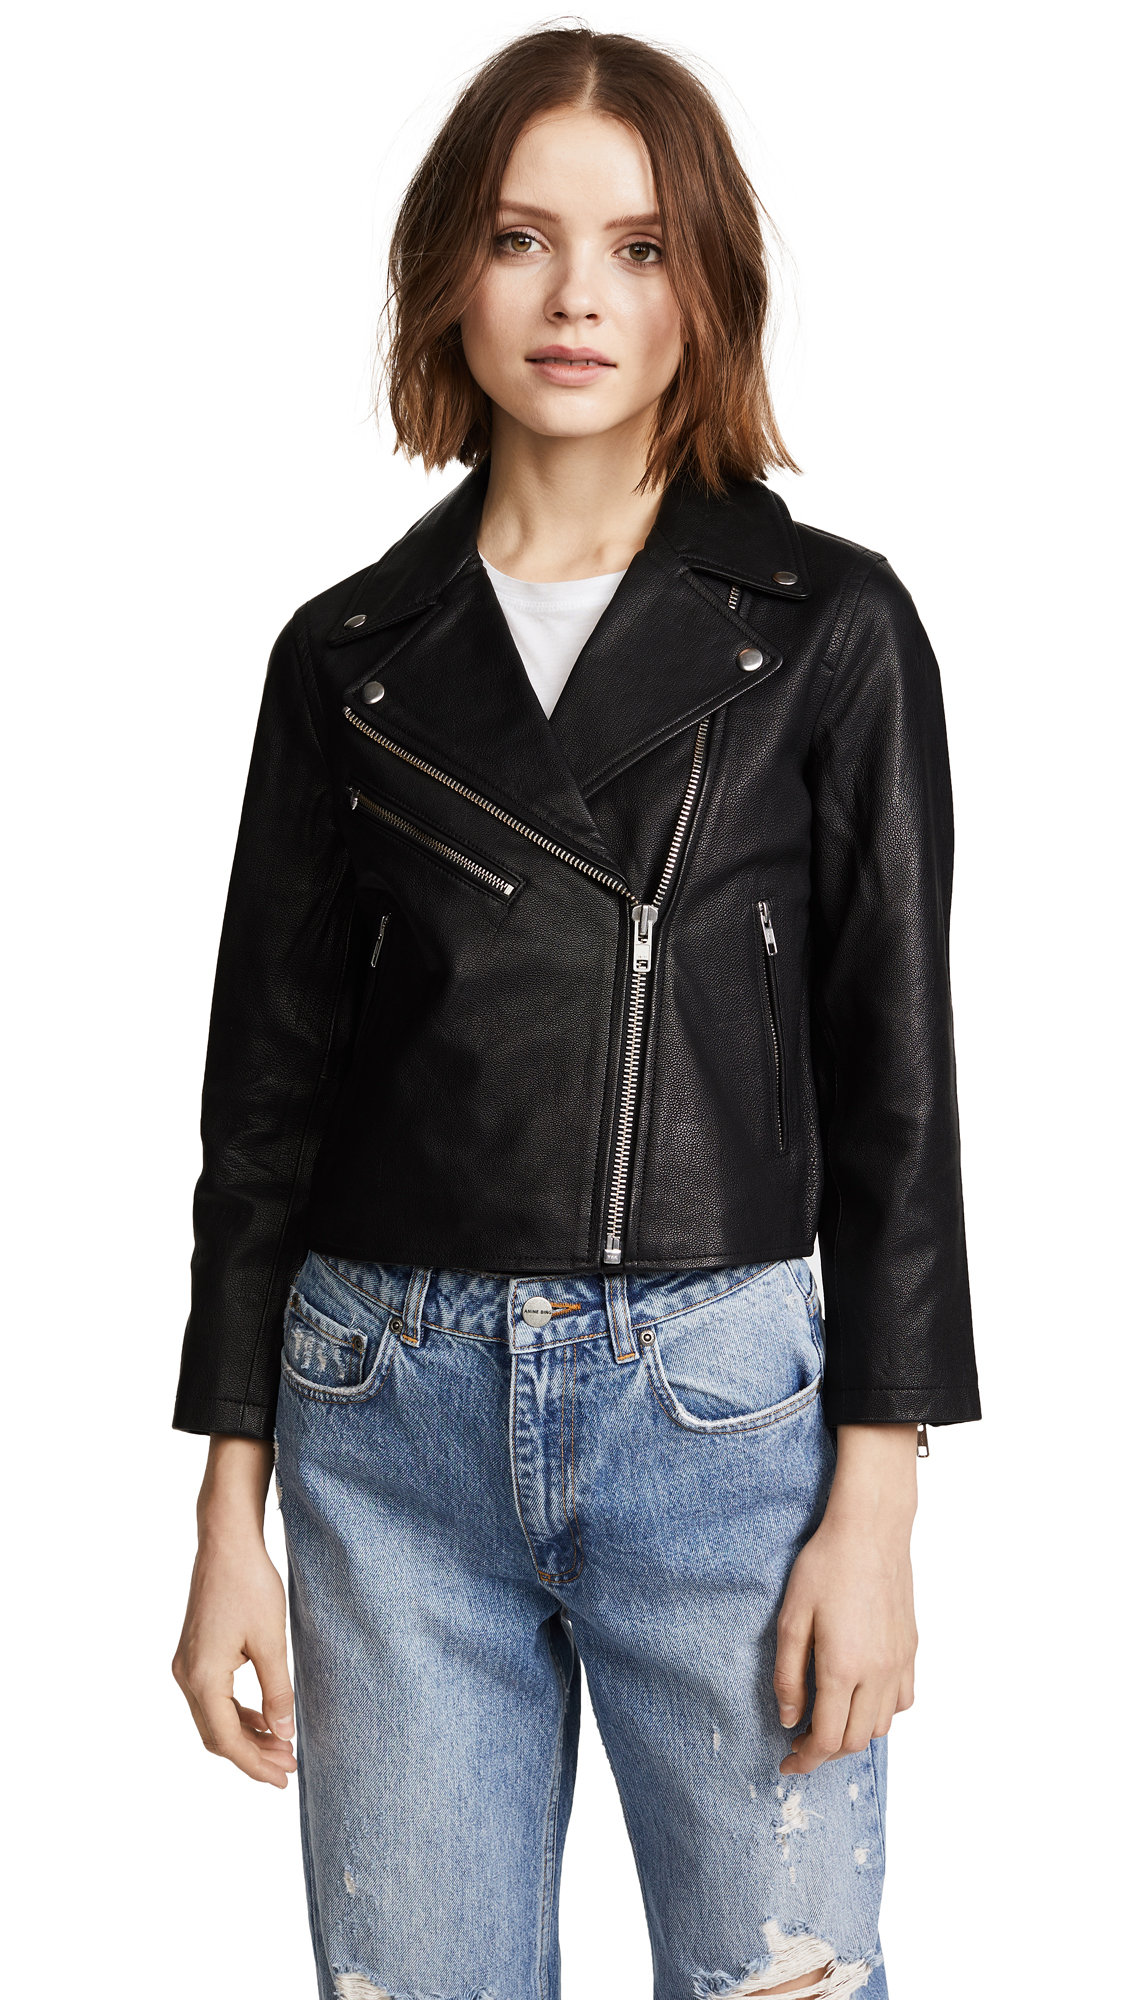 Madewell Cropped Leather Jacket - Black